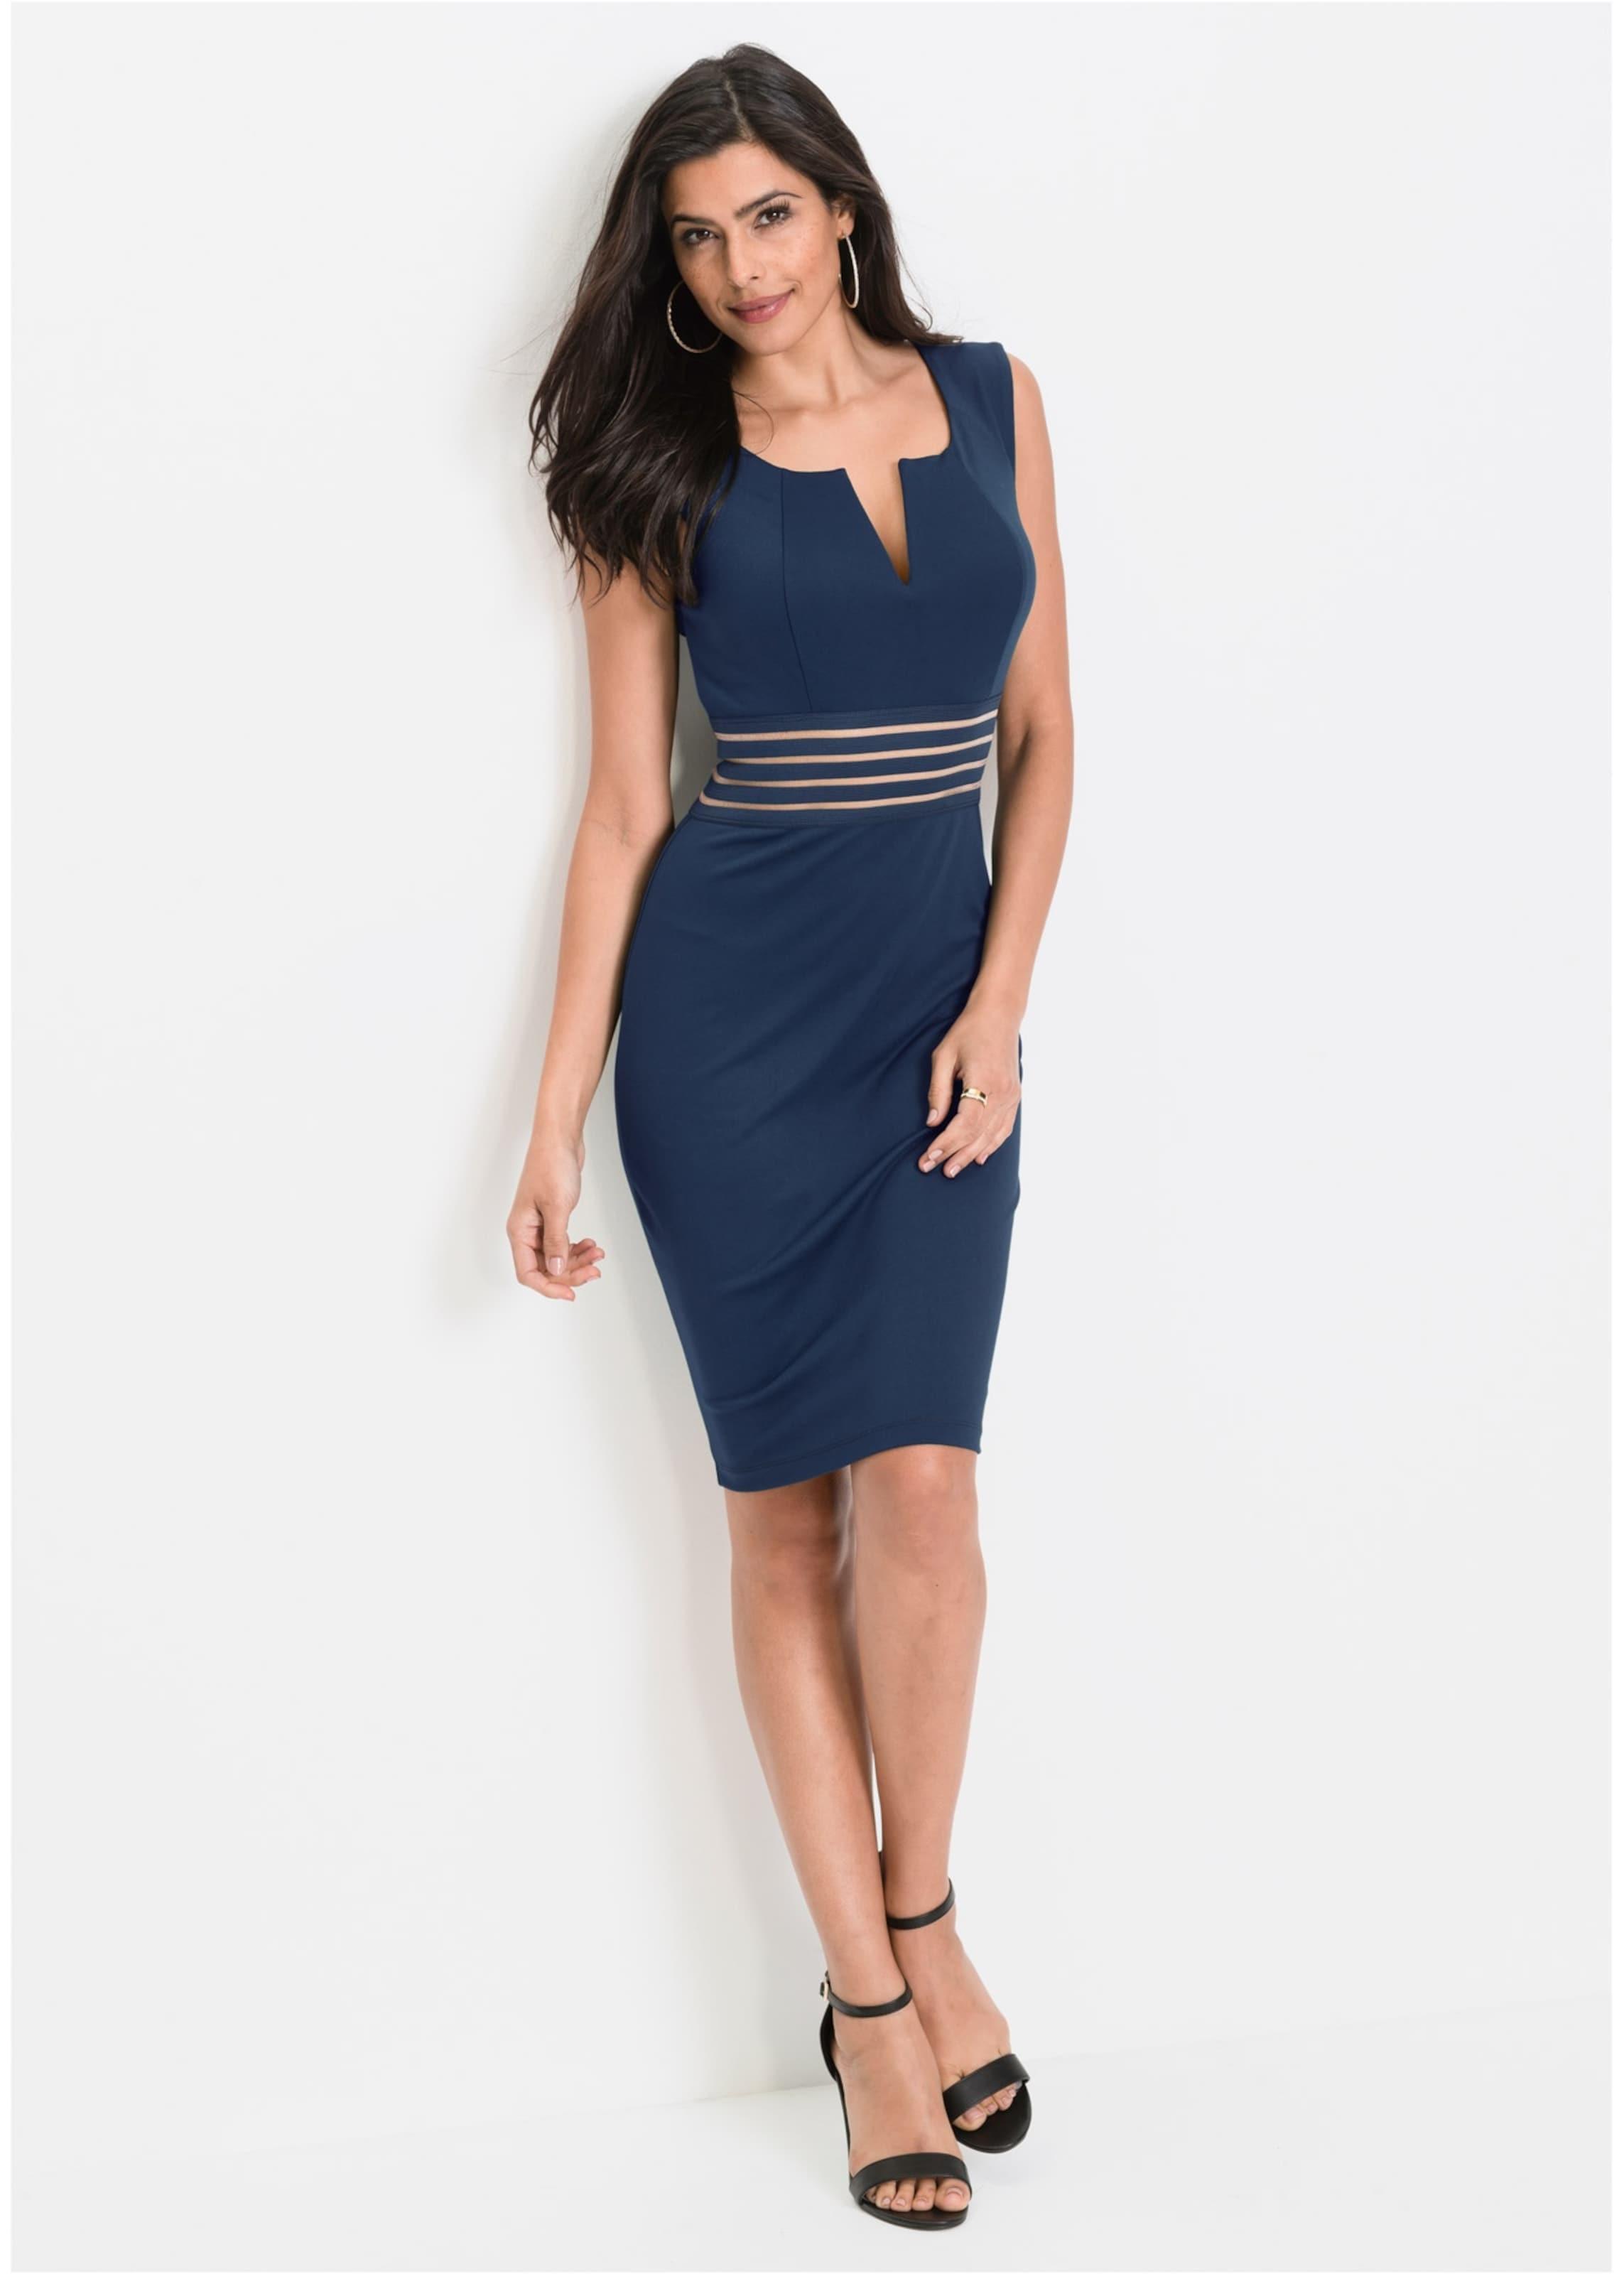 In Blau Mit Bonprix Netzeinsatz Transparentem Kleid ED9eH2WYI